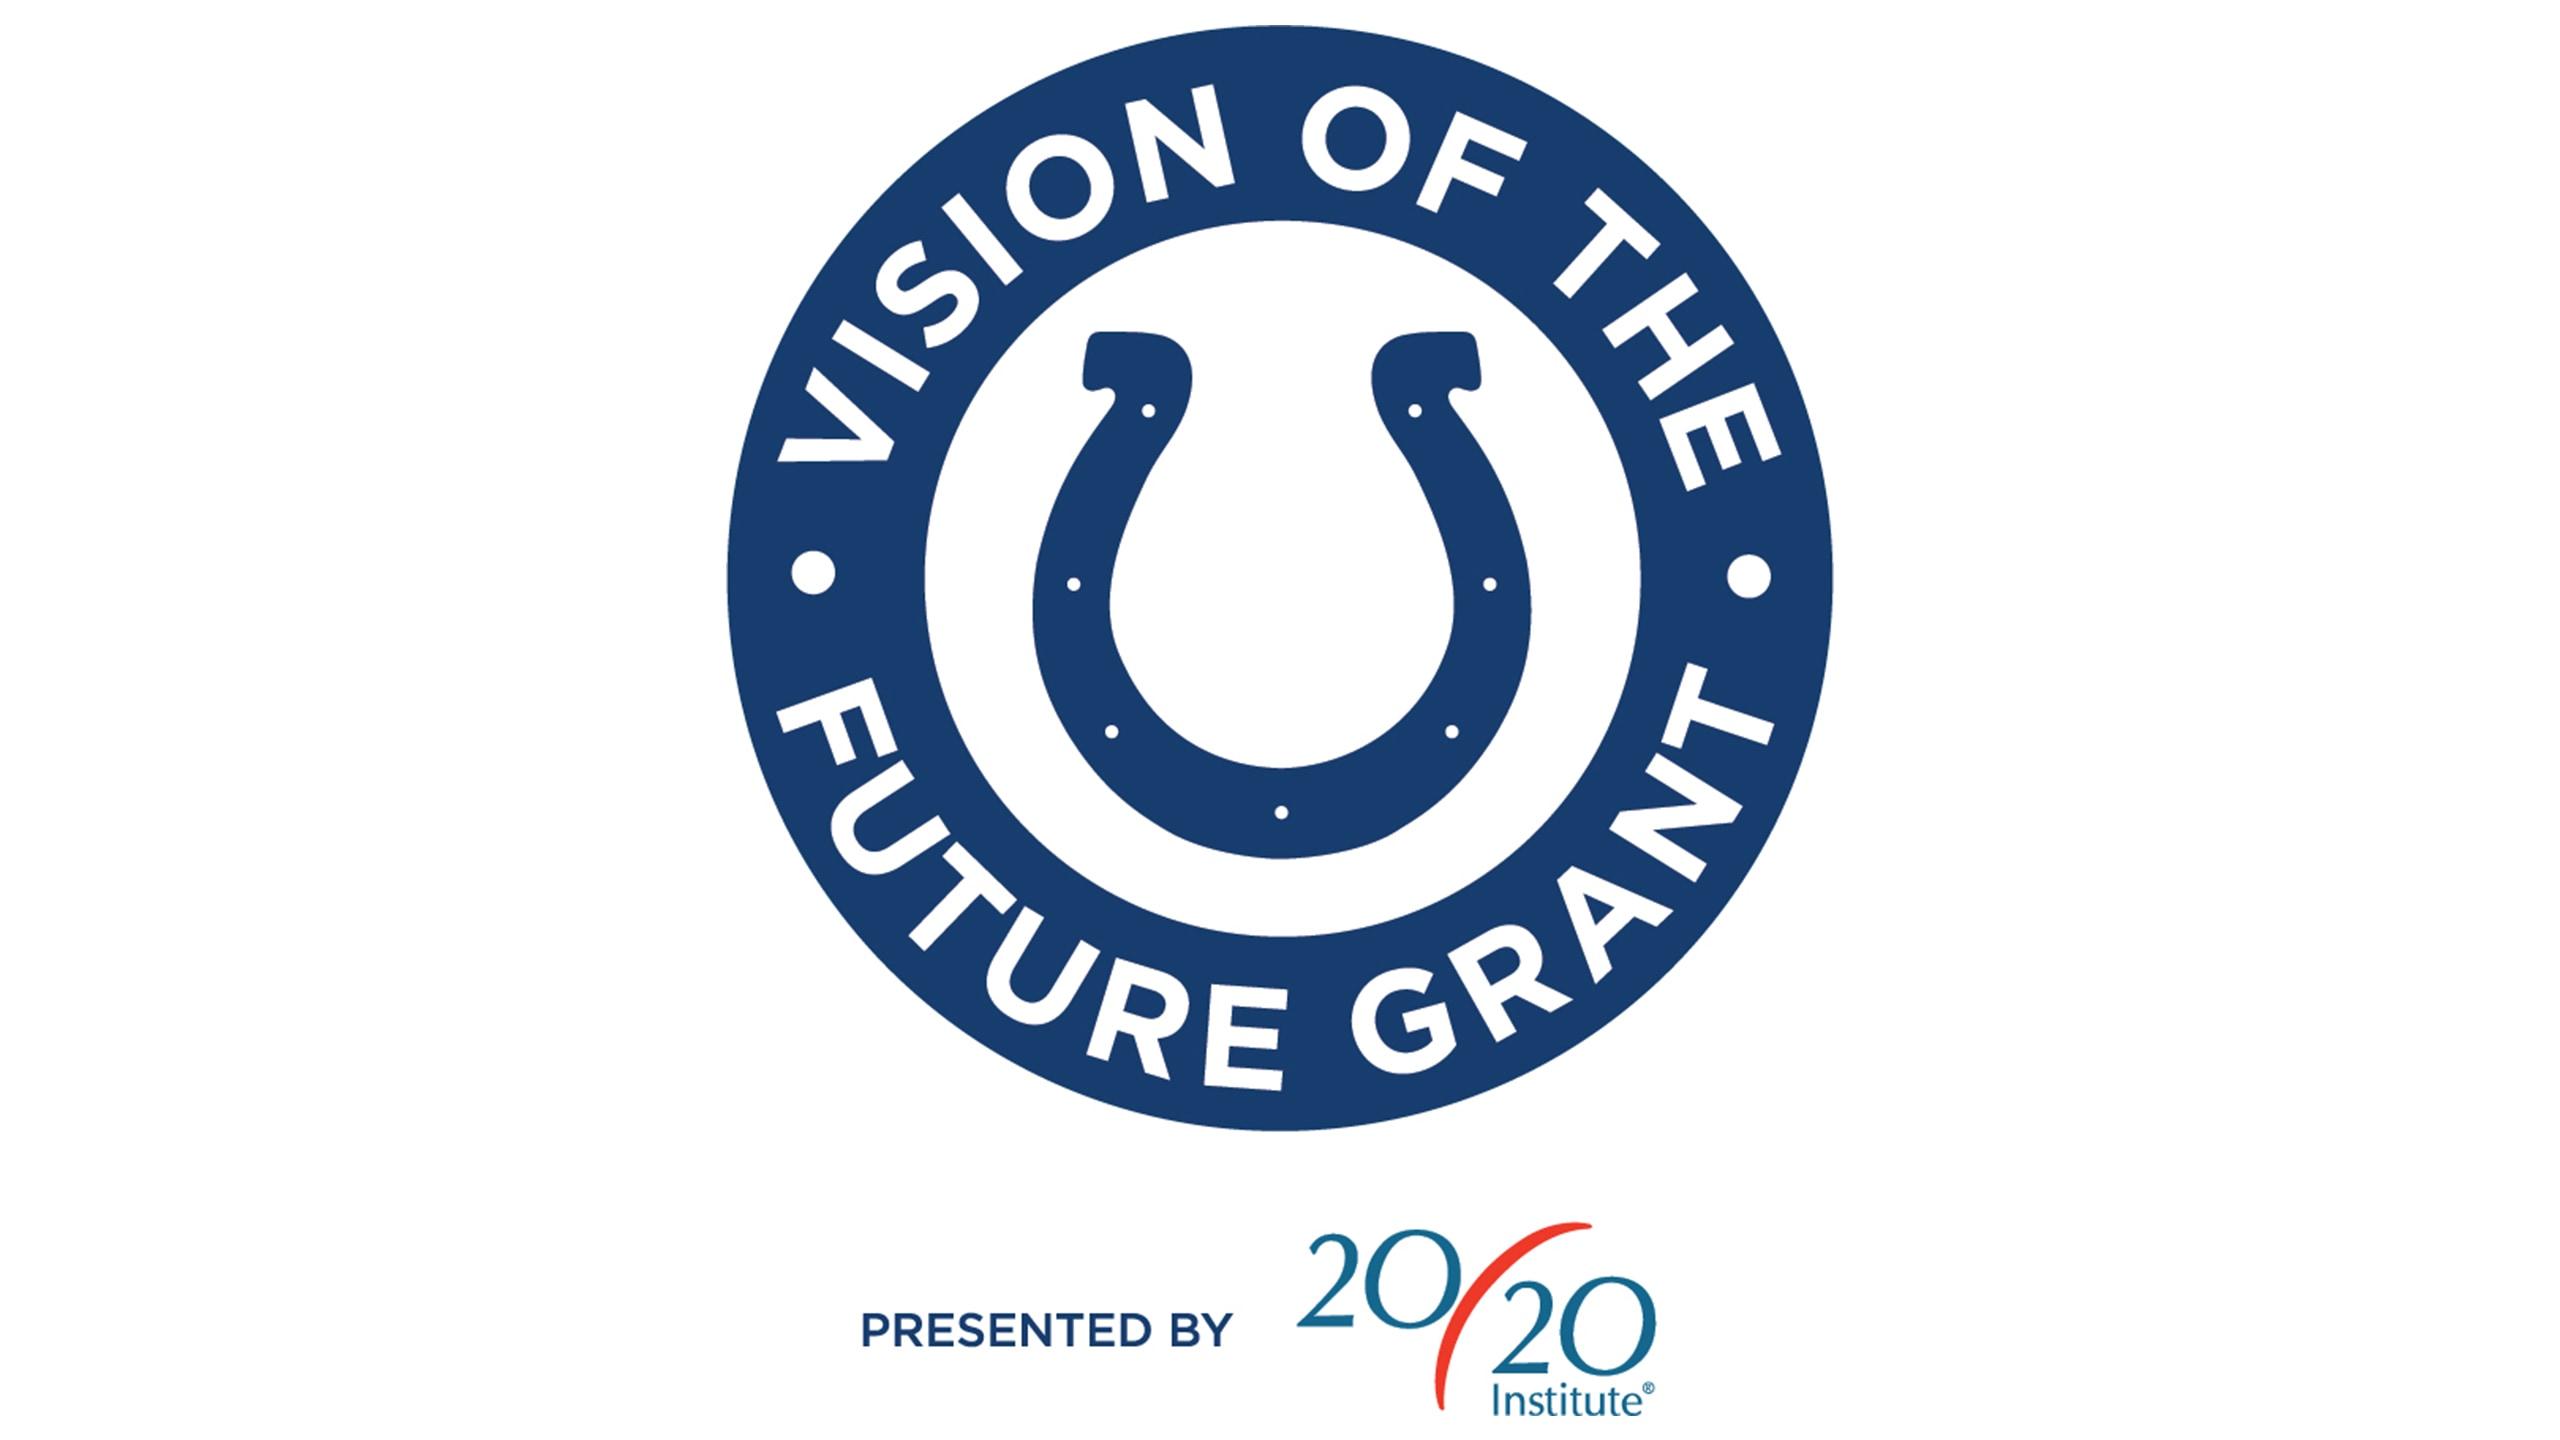 Vision of the Future Grant